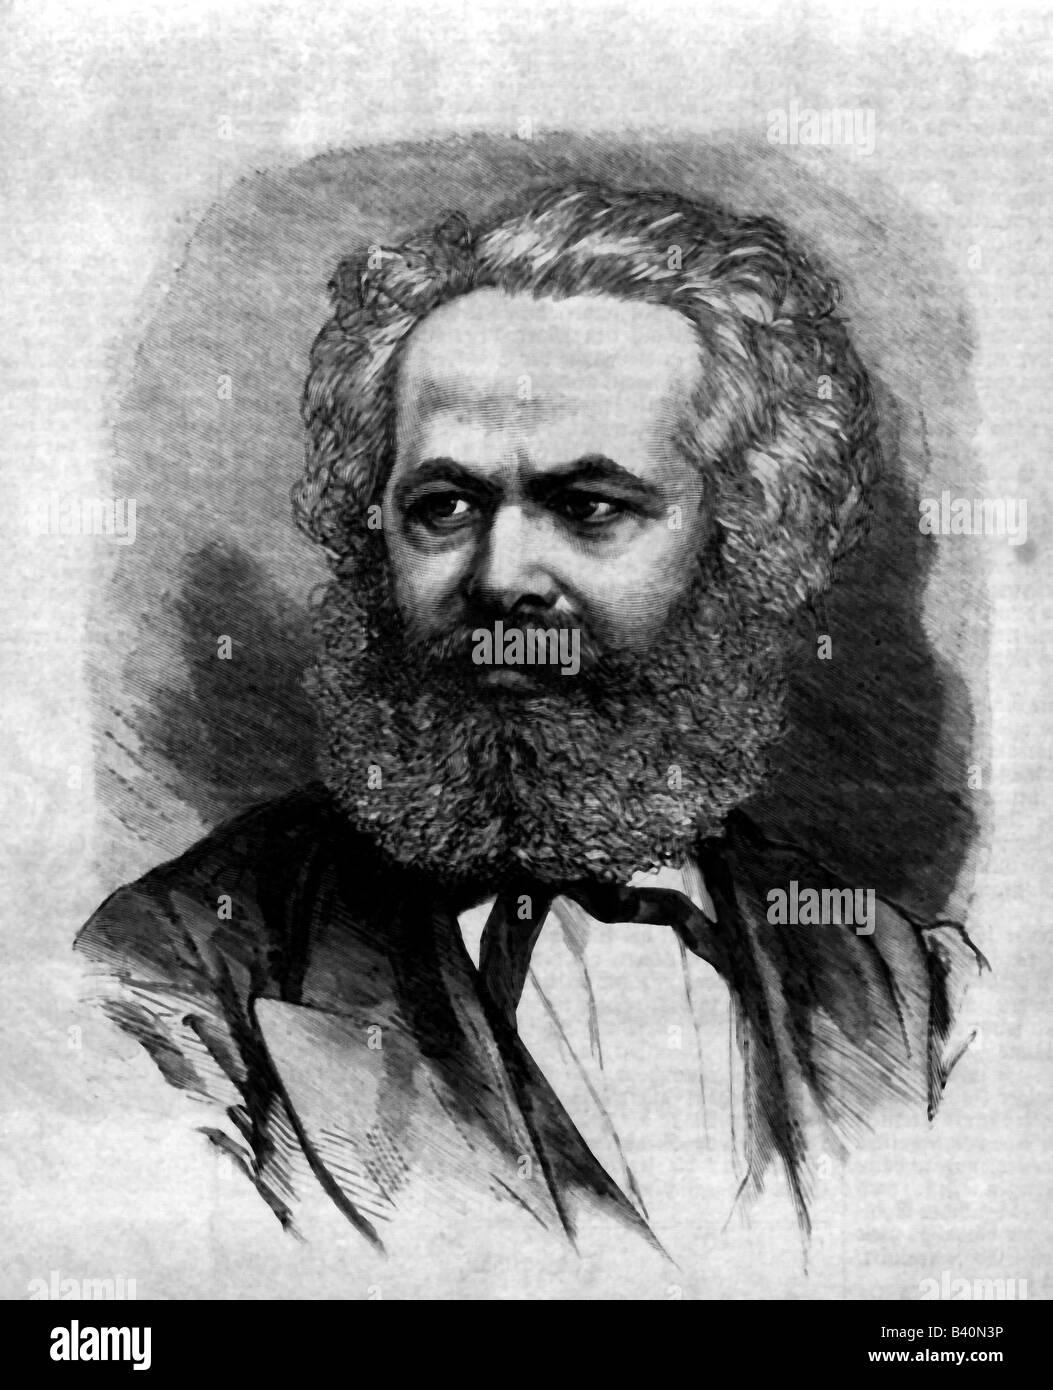 Marx, Karl, 5.5.1818 - 14.3.1883, German philosopher, portrait, engraving 1871, marxism, communism, 19th century, - Stock Image